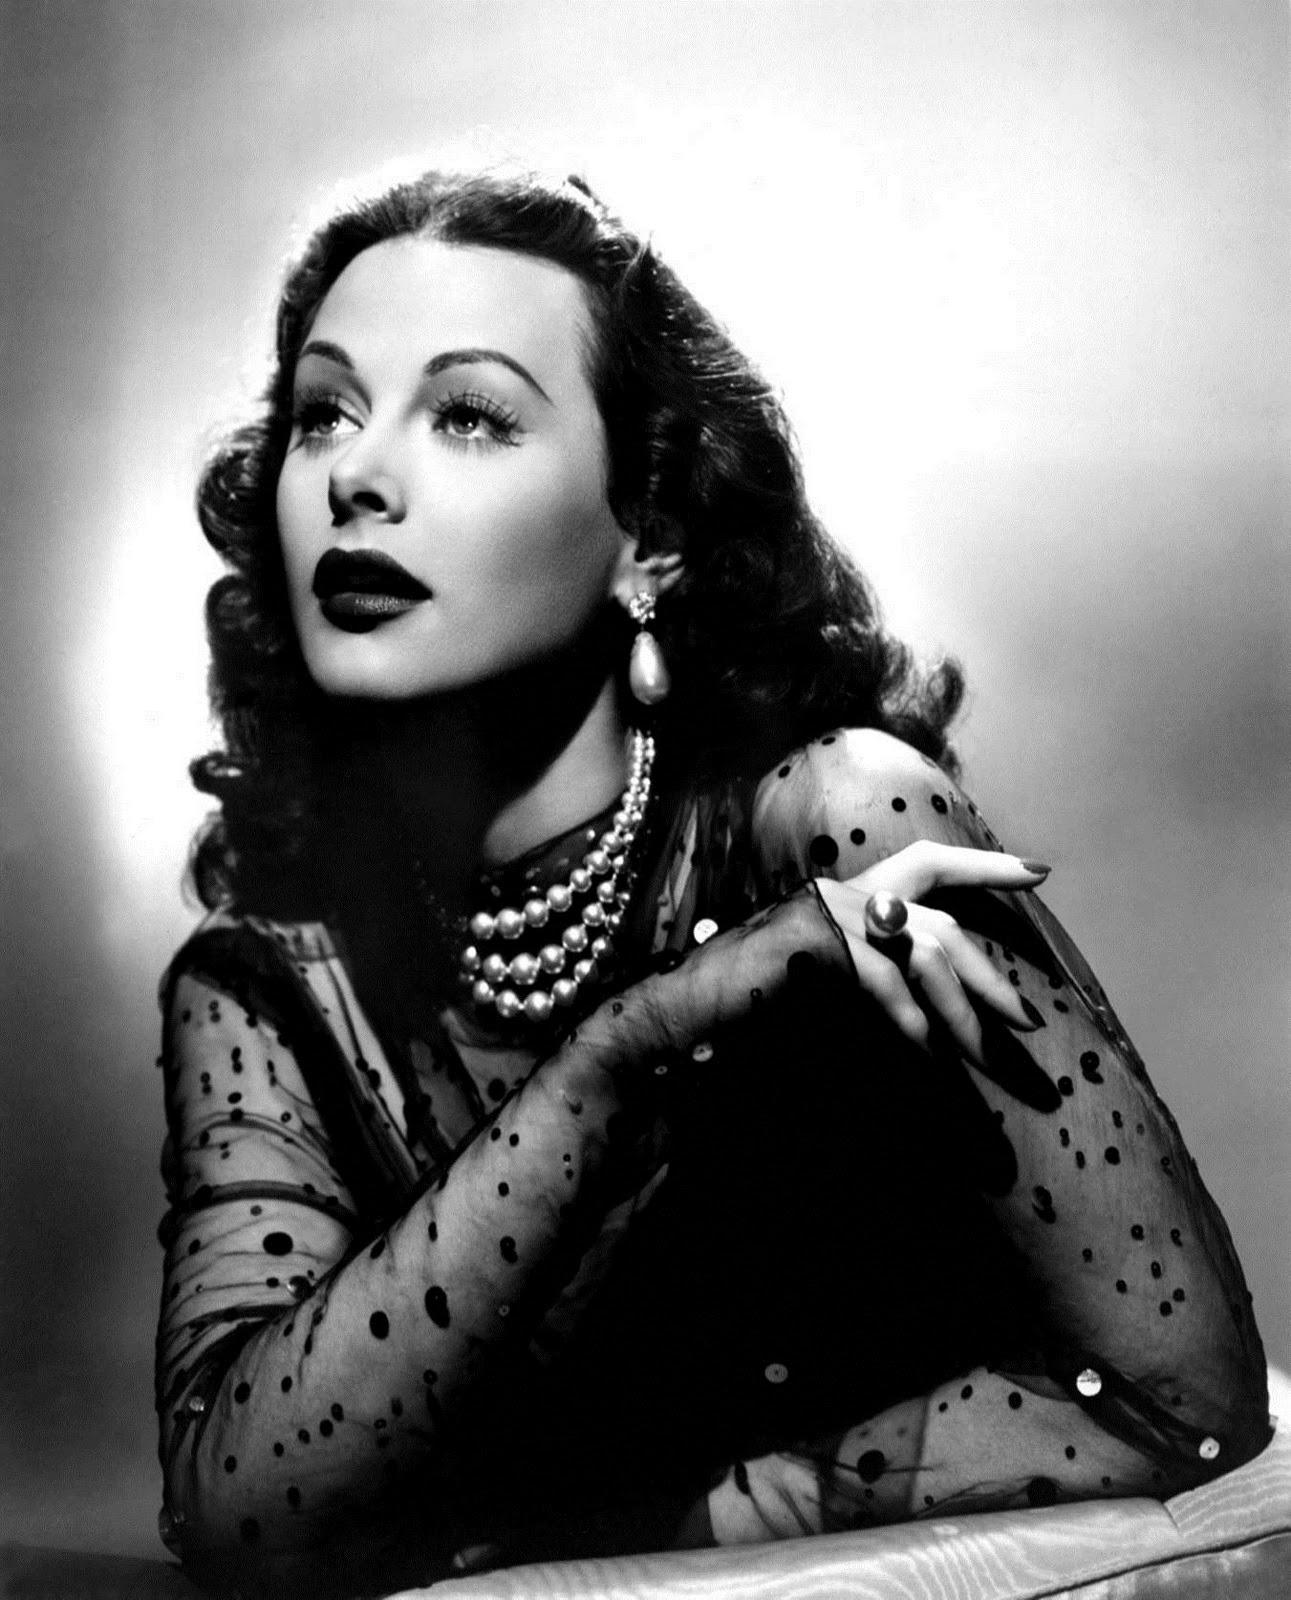 Hedy Lamarr<a href=&quot;https://lh3.googleusercontent.com/-FlYhmFXCWhw/TYiHX1x7cDI/AAAAAAAAFhY/WPc1uhqp8ZA/s1600/hedy-lamarr-04.jpg&quot; target=&quot;_blank&quot;>source</a>